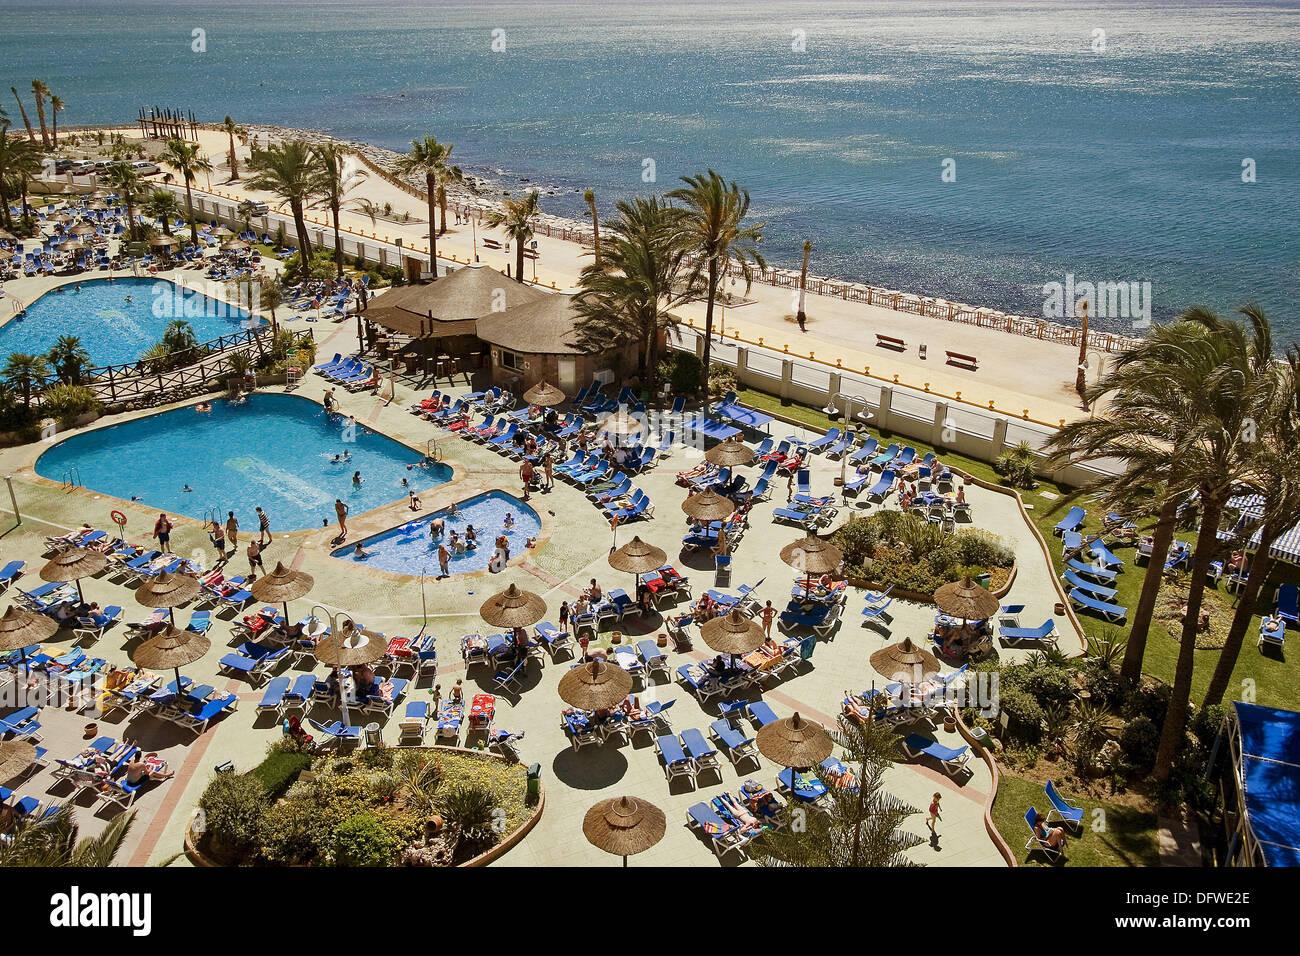 Hotel Sunset Beach Benalmadena